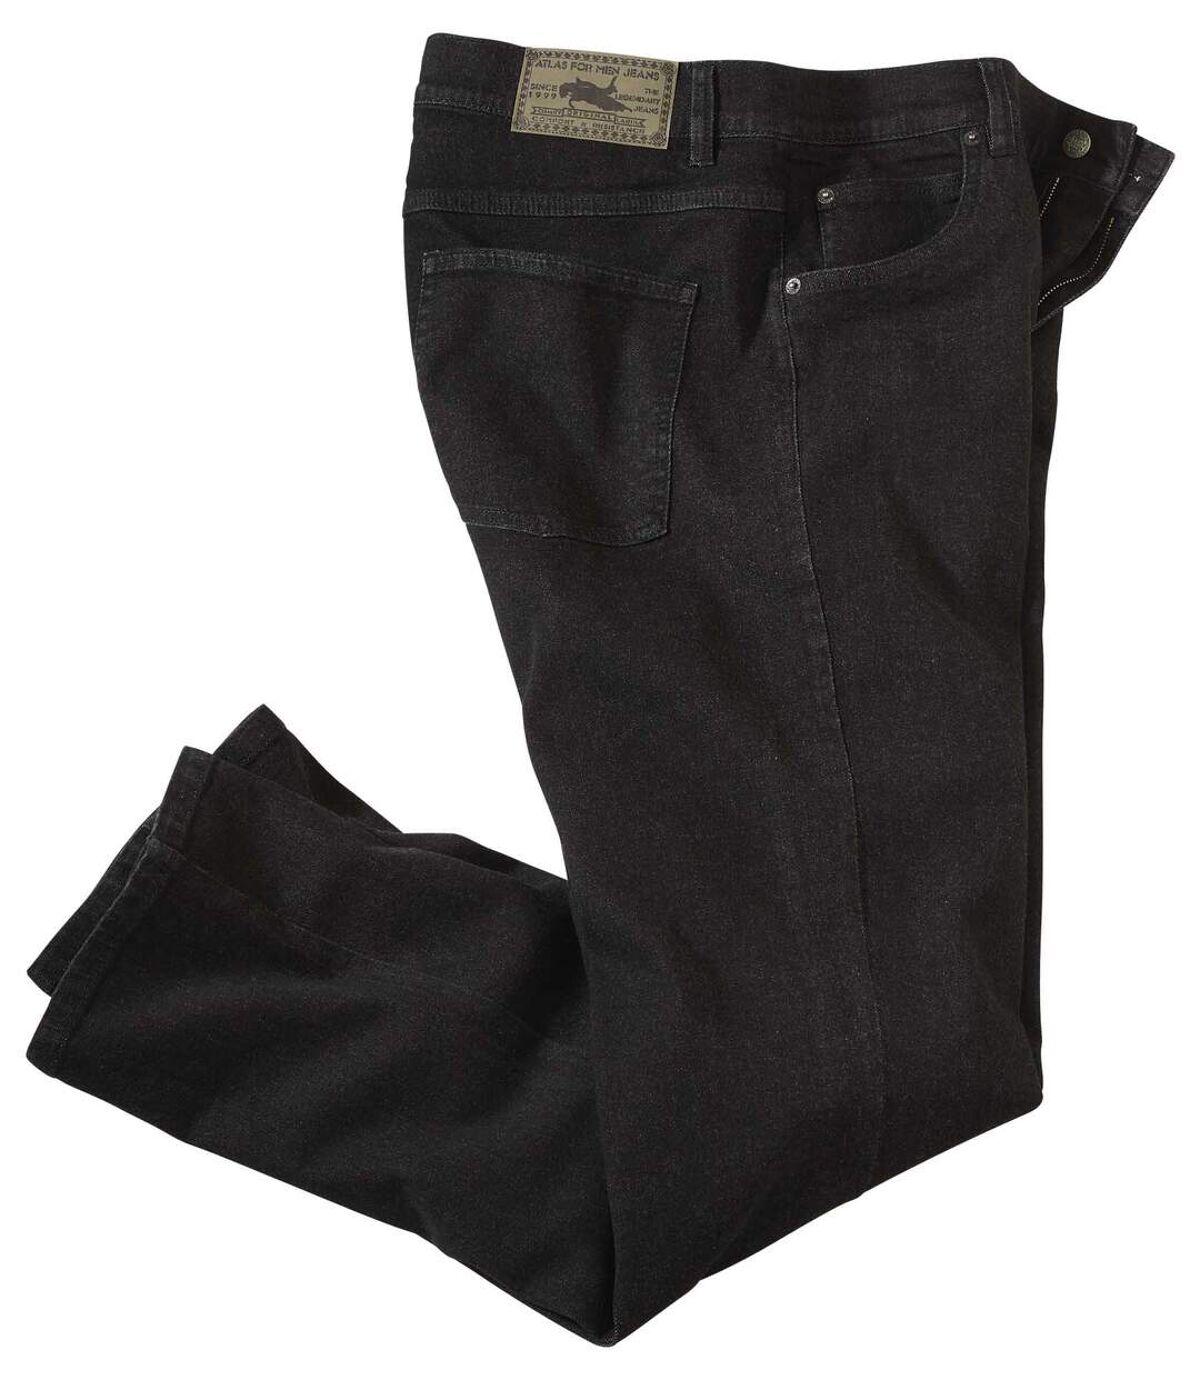 Men's Black Stretch Denim Jeans Atlas For Men